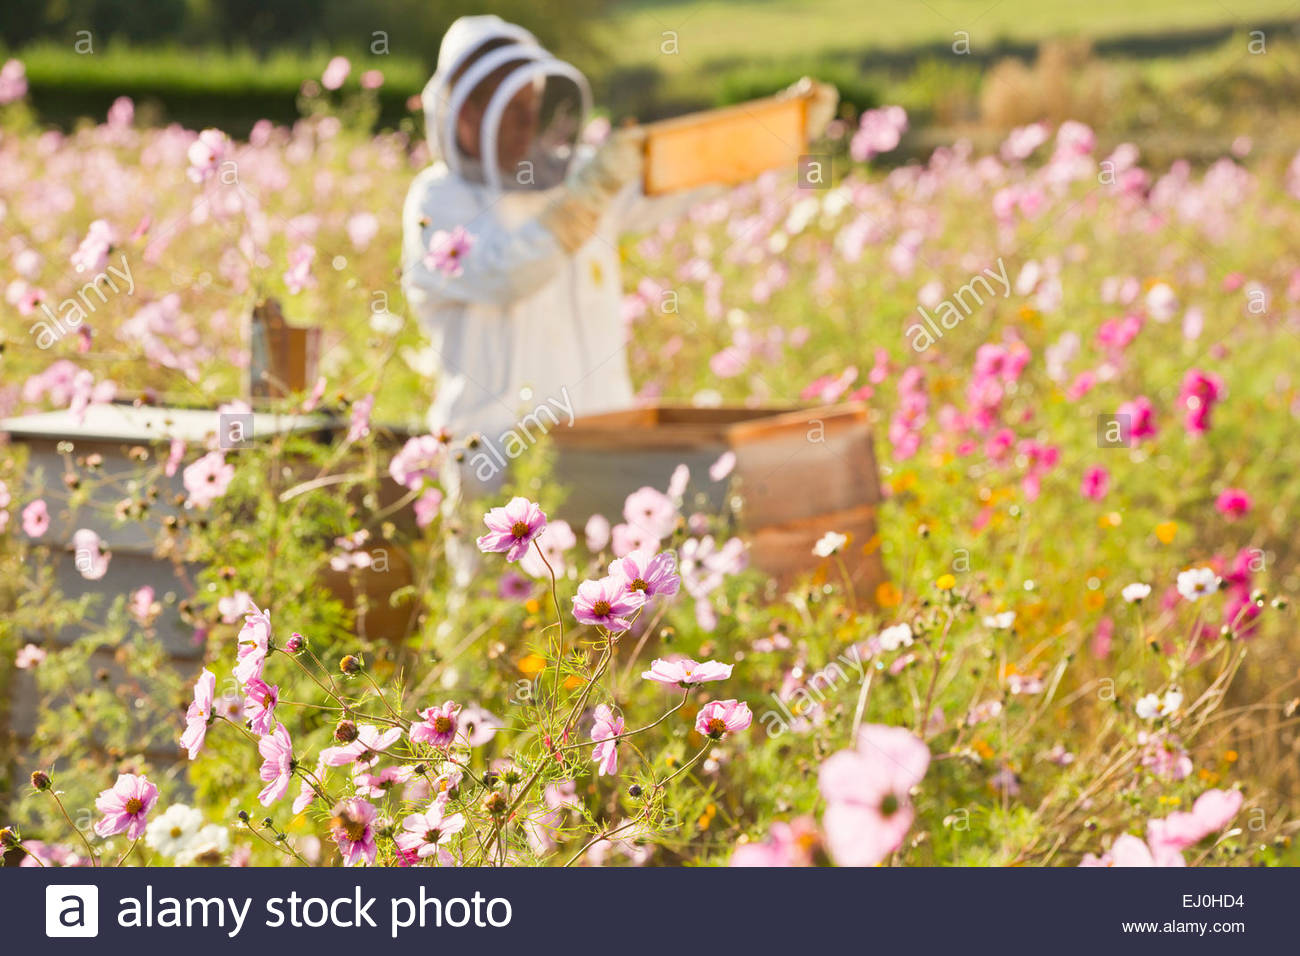 Beekeeper Checking Honey On Beehive Frame In Field Full Of